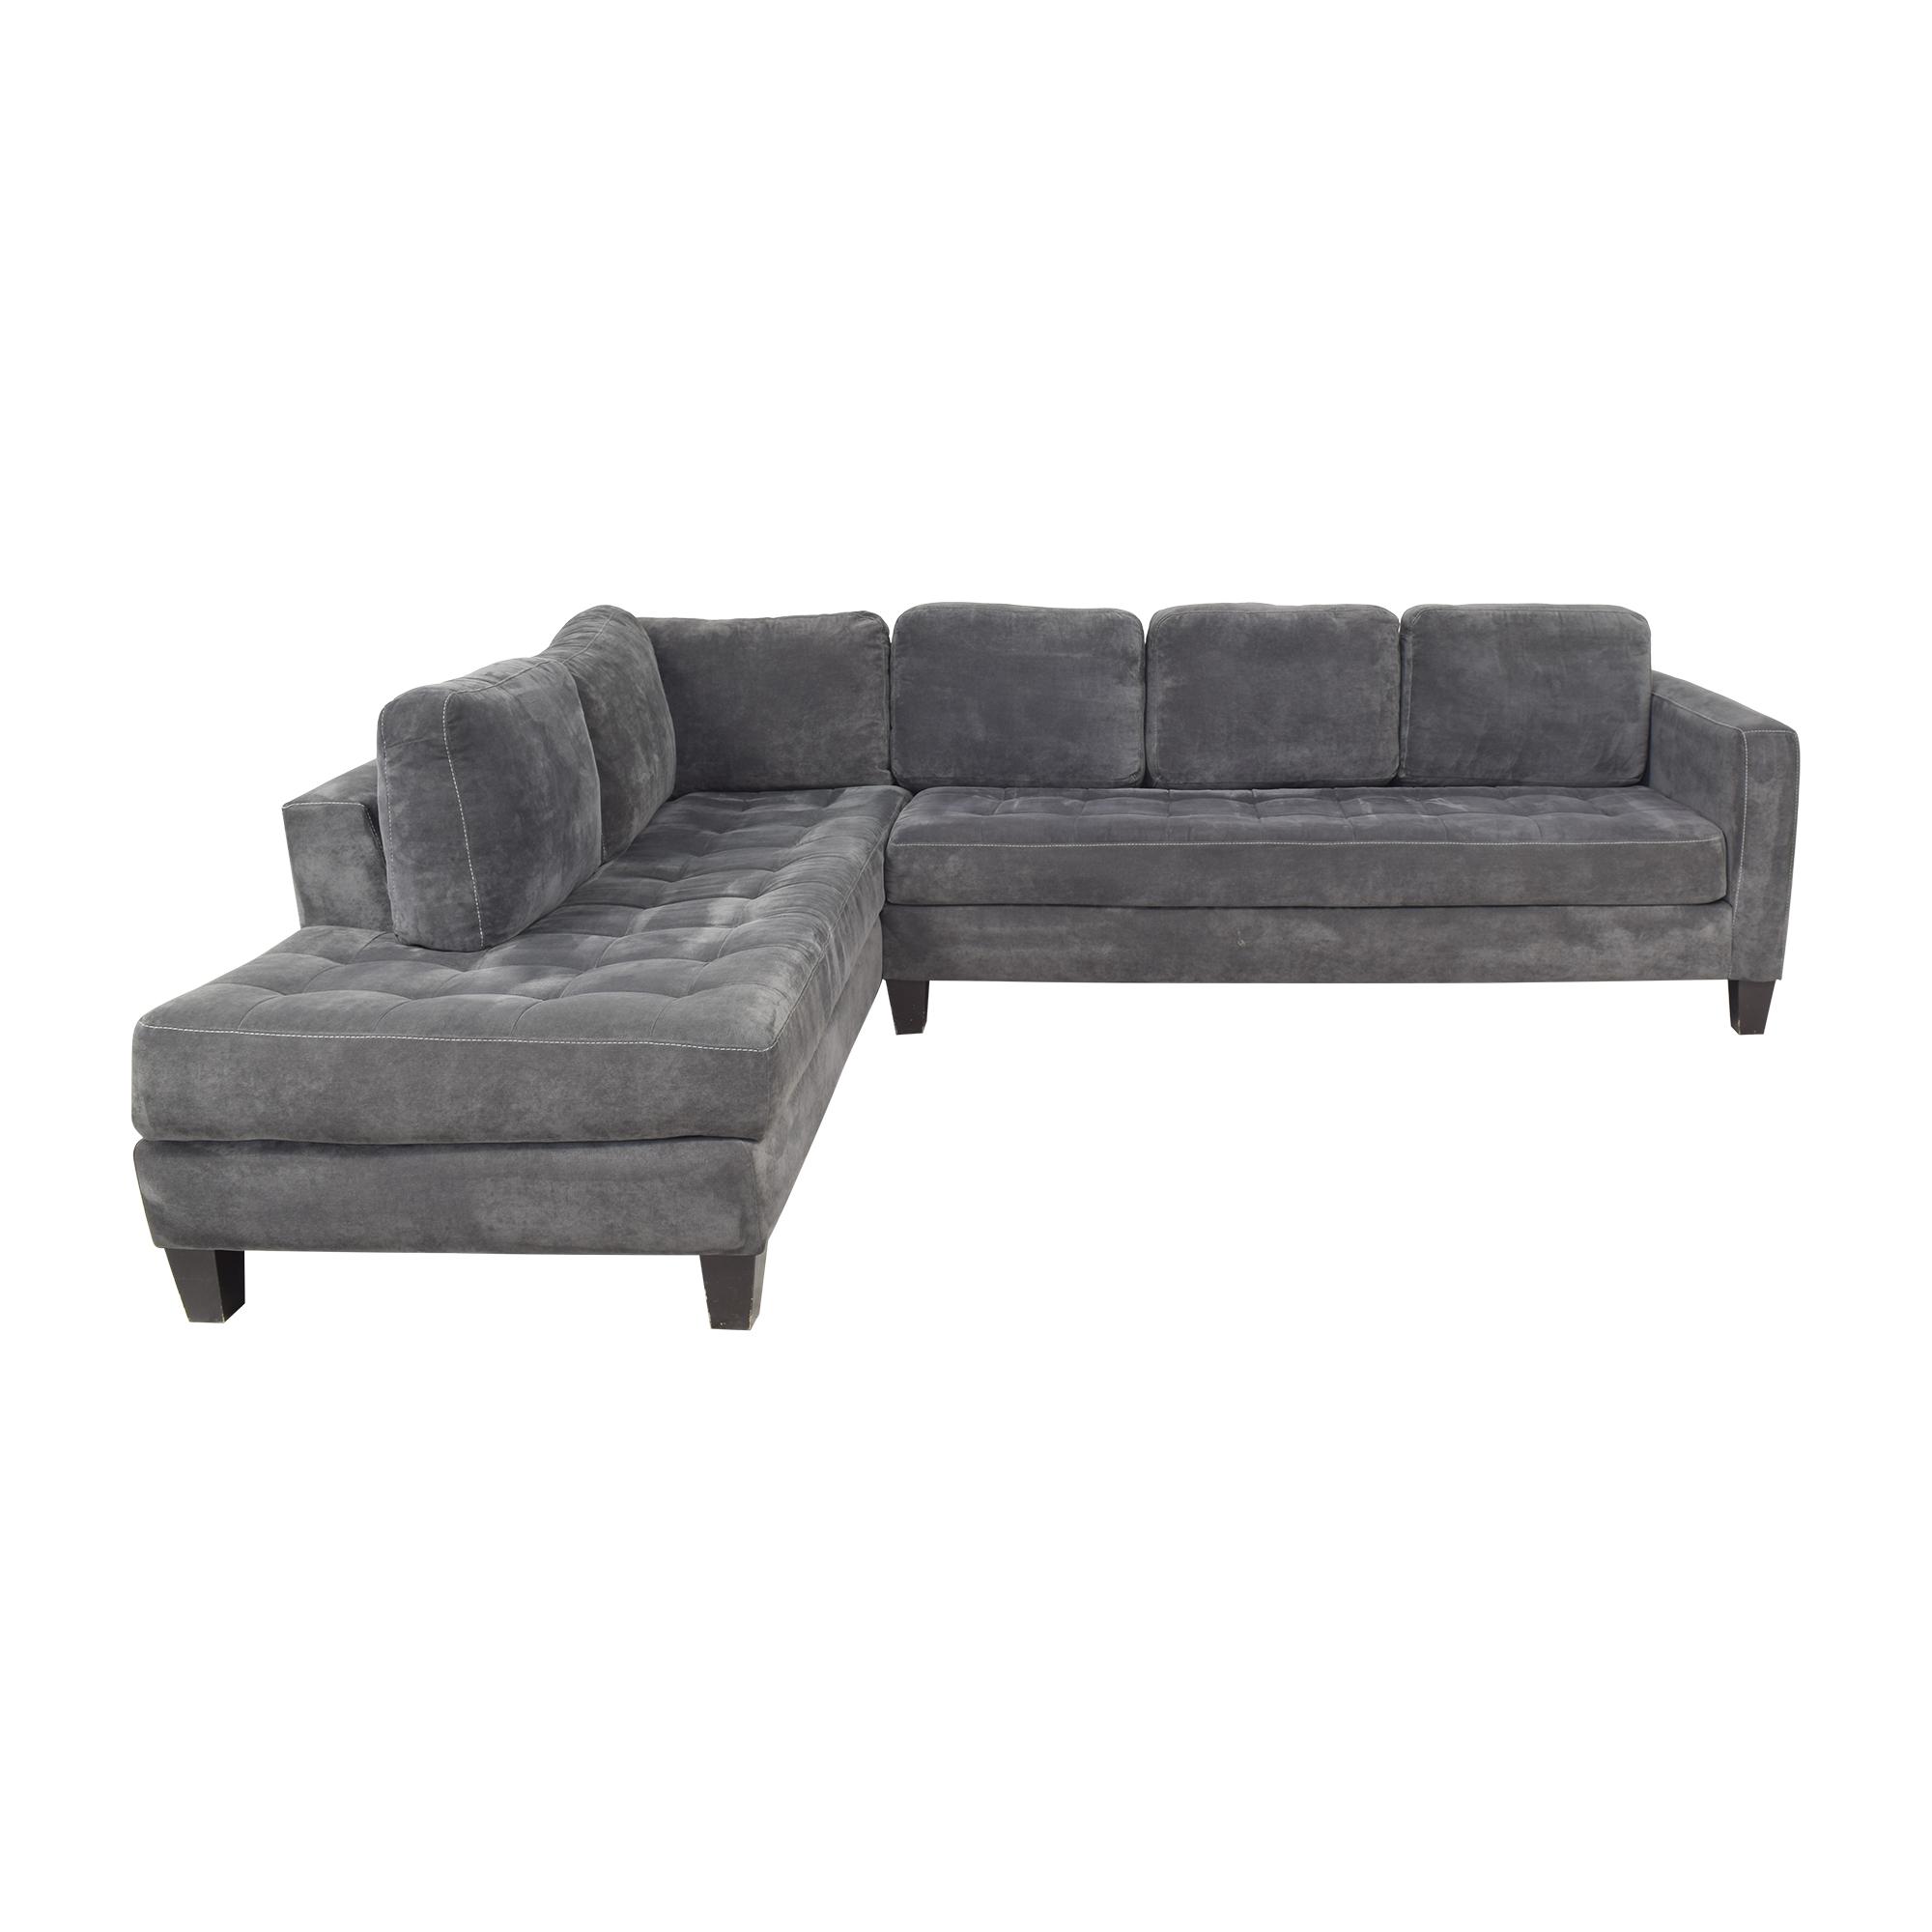 Macy's Macy's Milo Sectional Sofa nyc